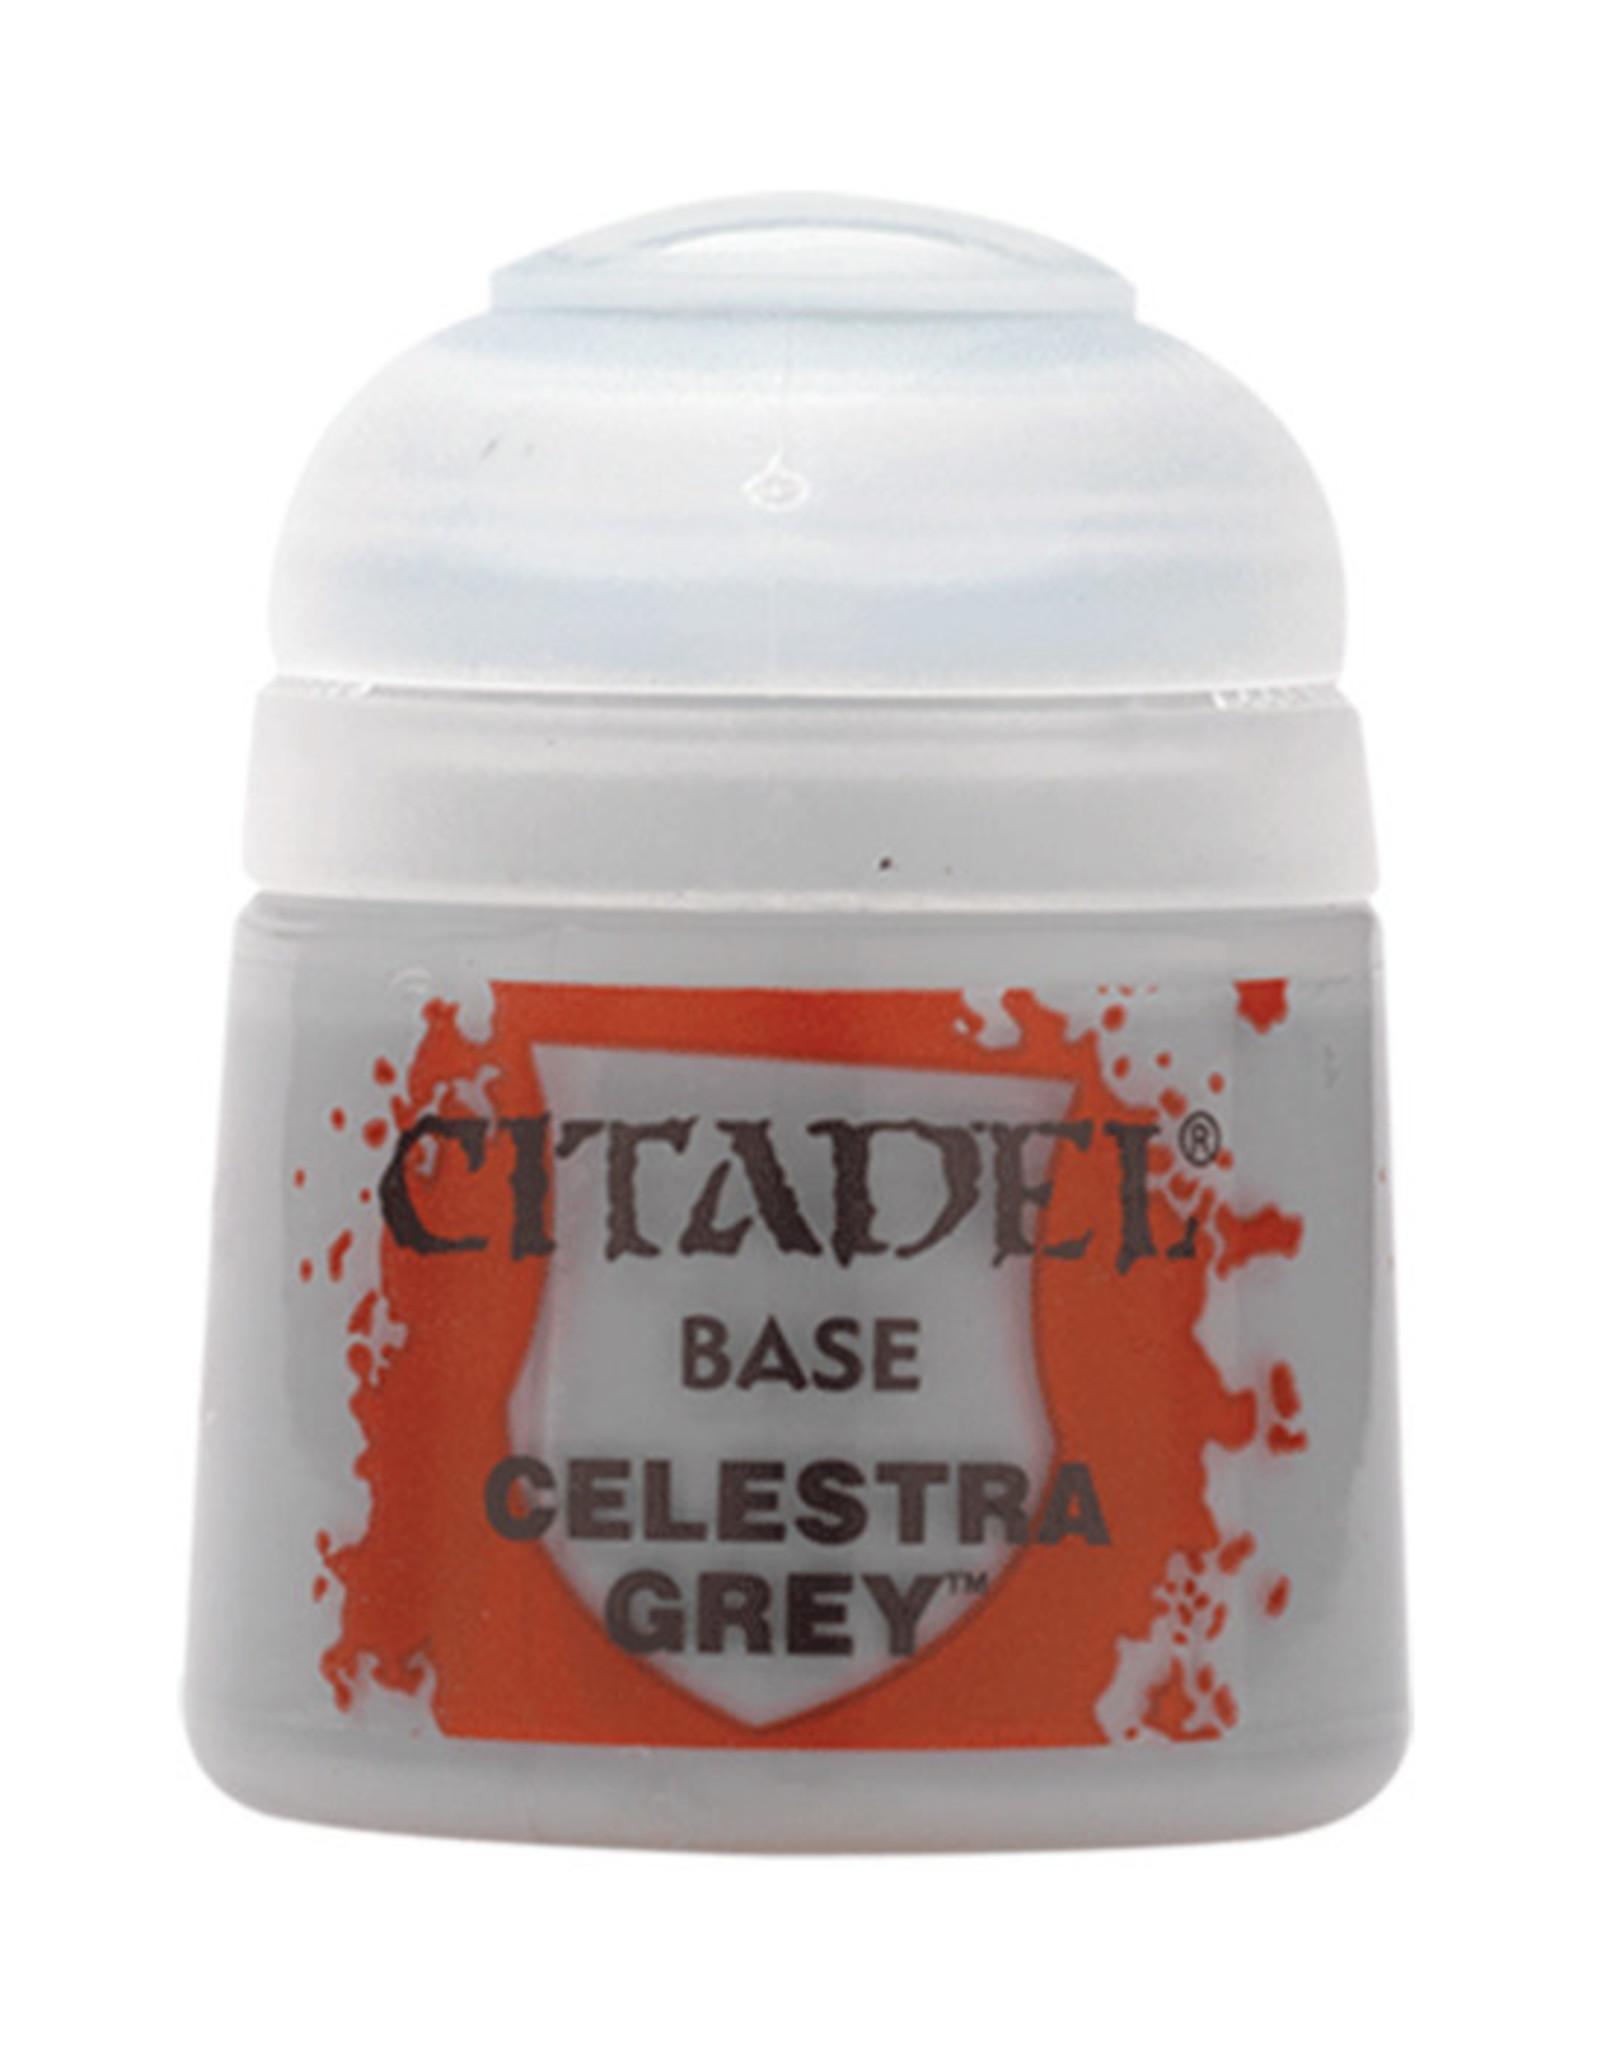 Citadel Citadel Colour: Base - Celestra Grey